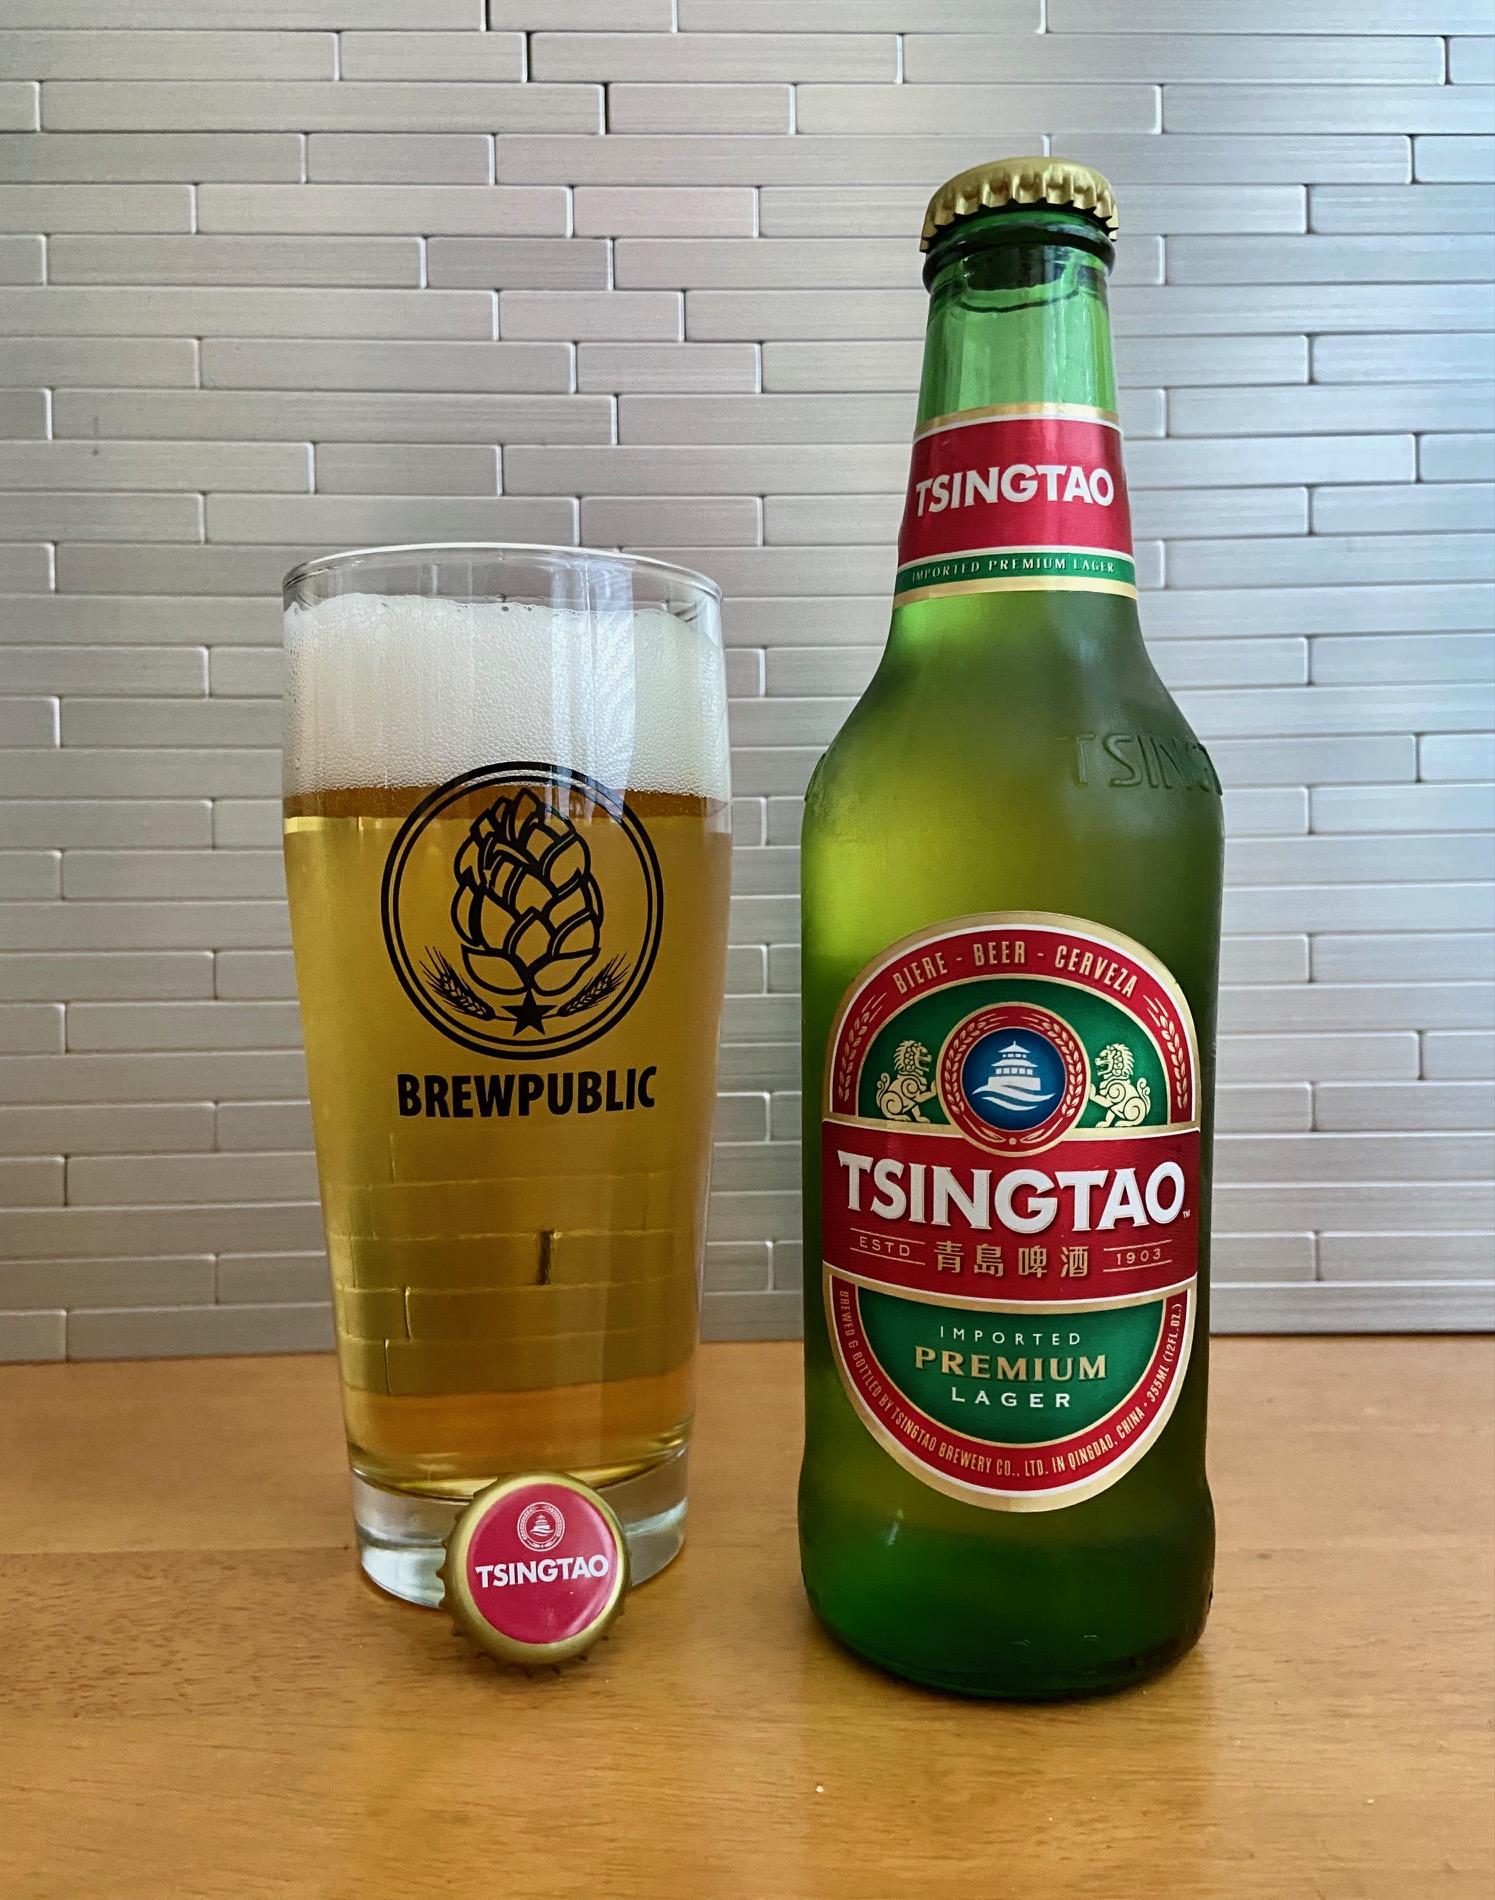 A 12oz bottle of Tsingtao poured into a Brewpublic Willi Becher glass.